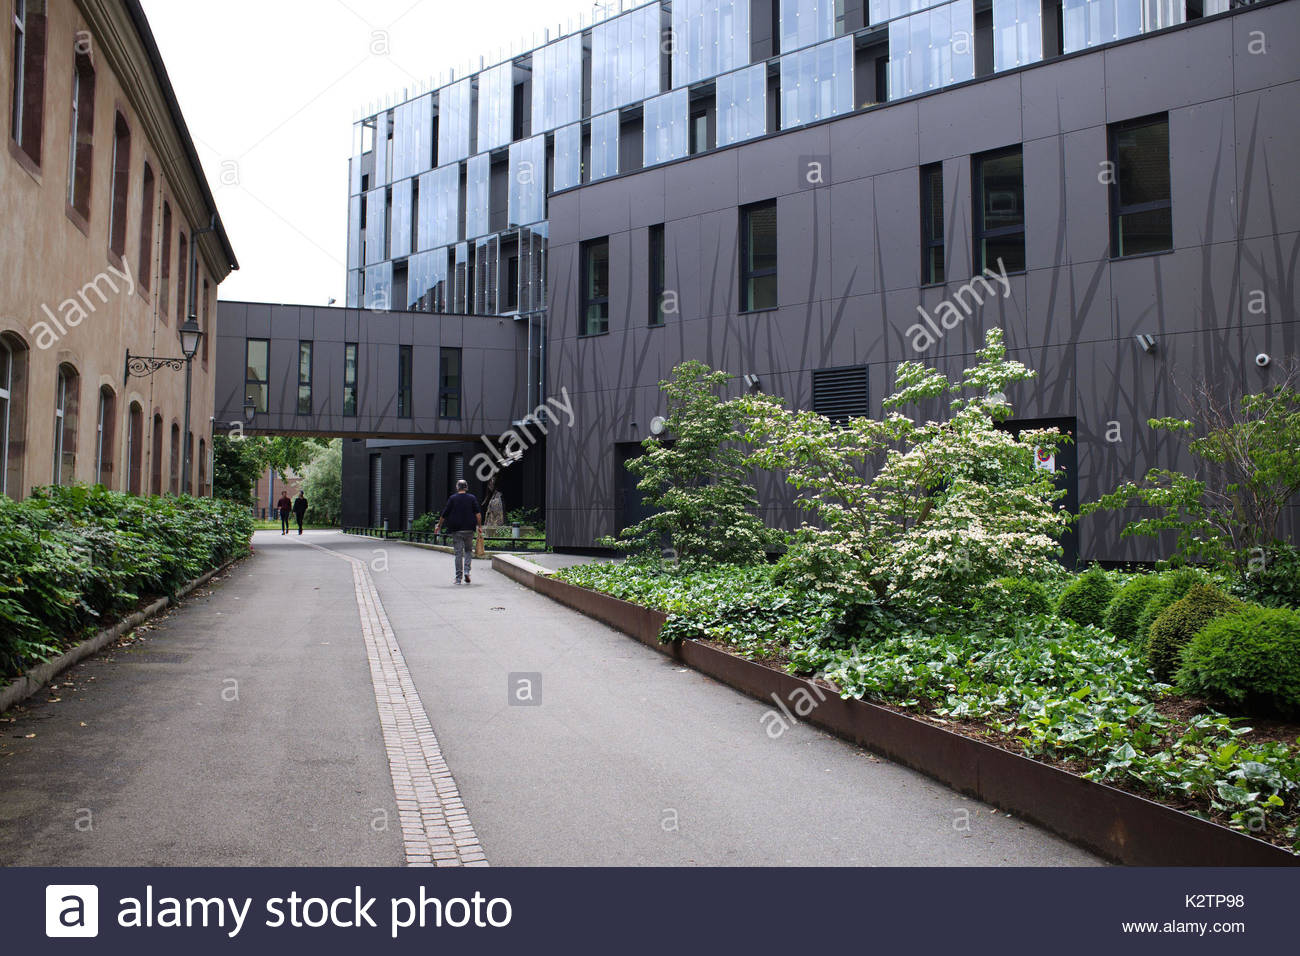 France, Alsace, Bas Rhin, Strasbourg, l'entree de l'Ecole National d'Administration, ENA, cree par Charles de Gaulle Stock Photo